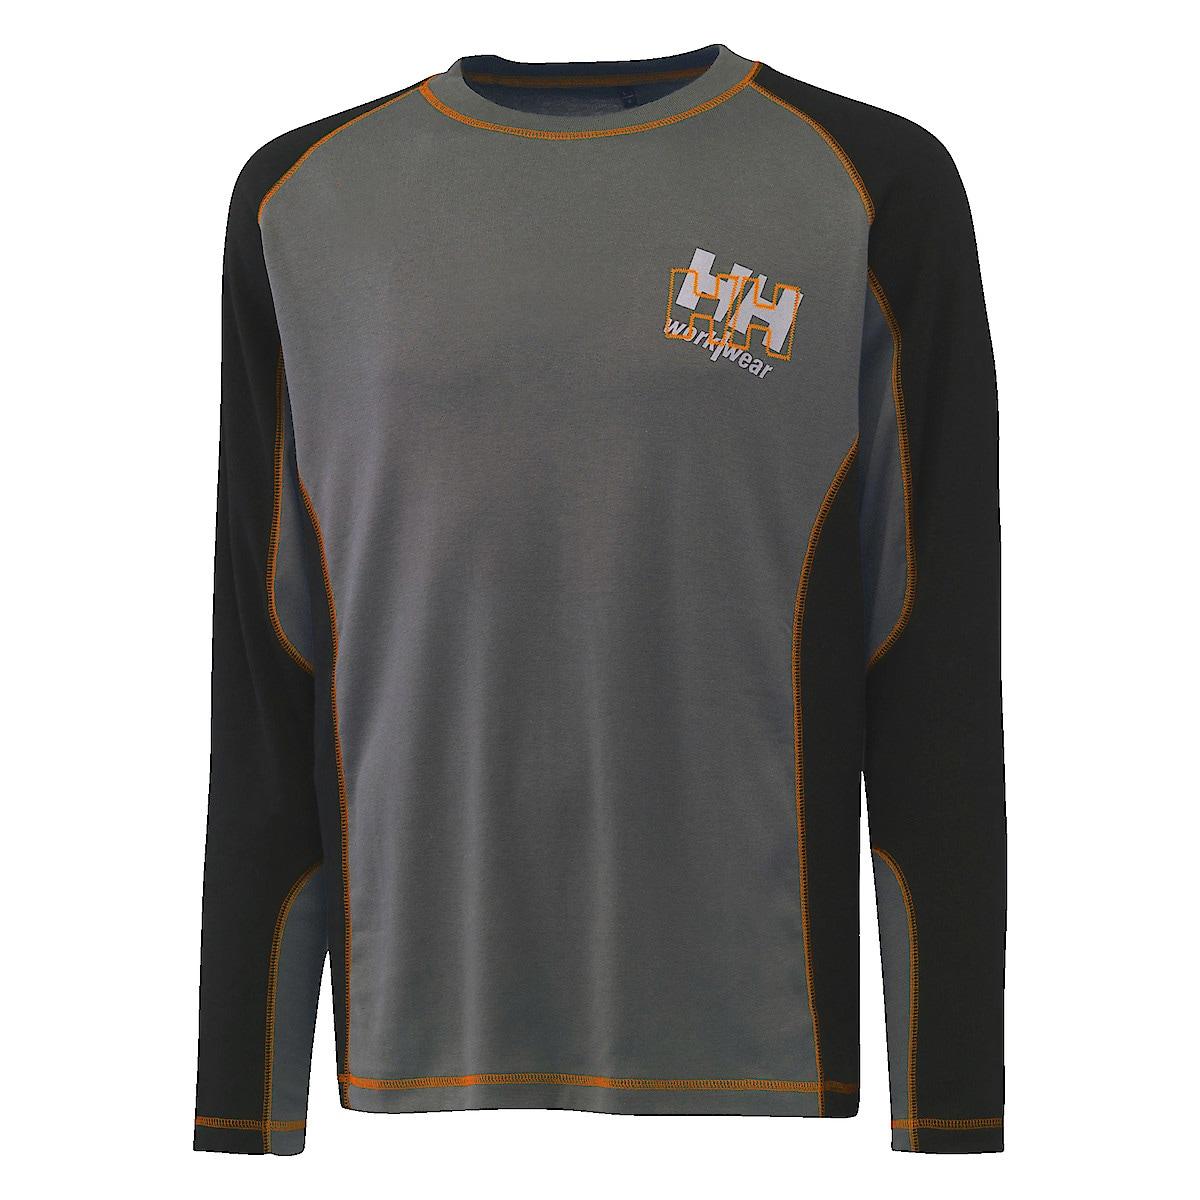 Helly Hansen T-shirt Chelsea, langarmet